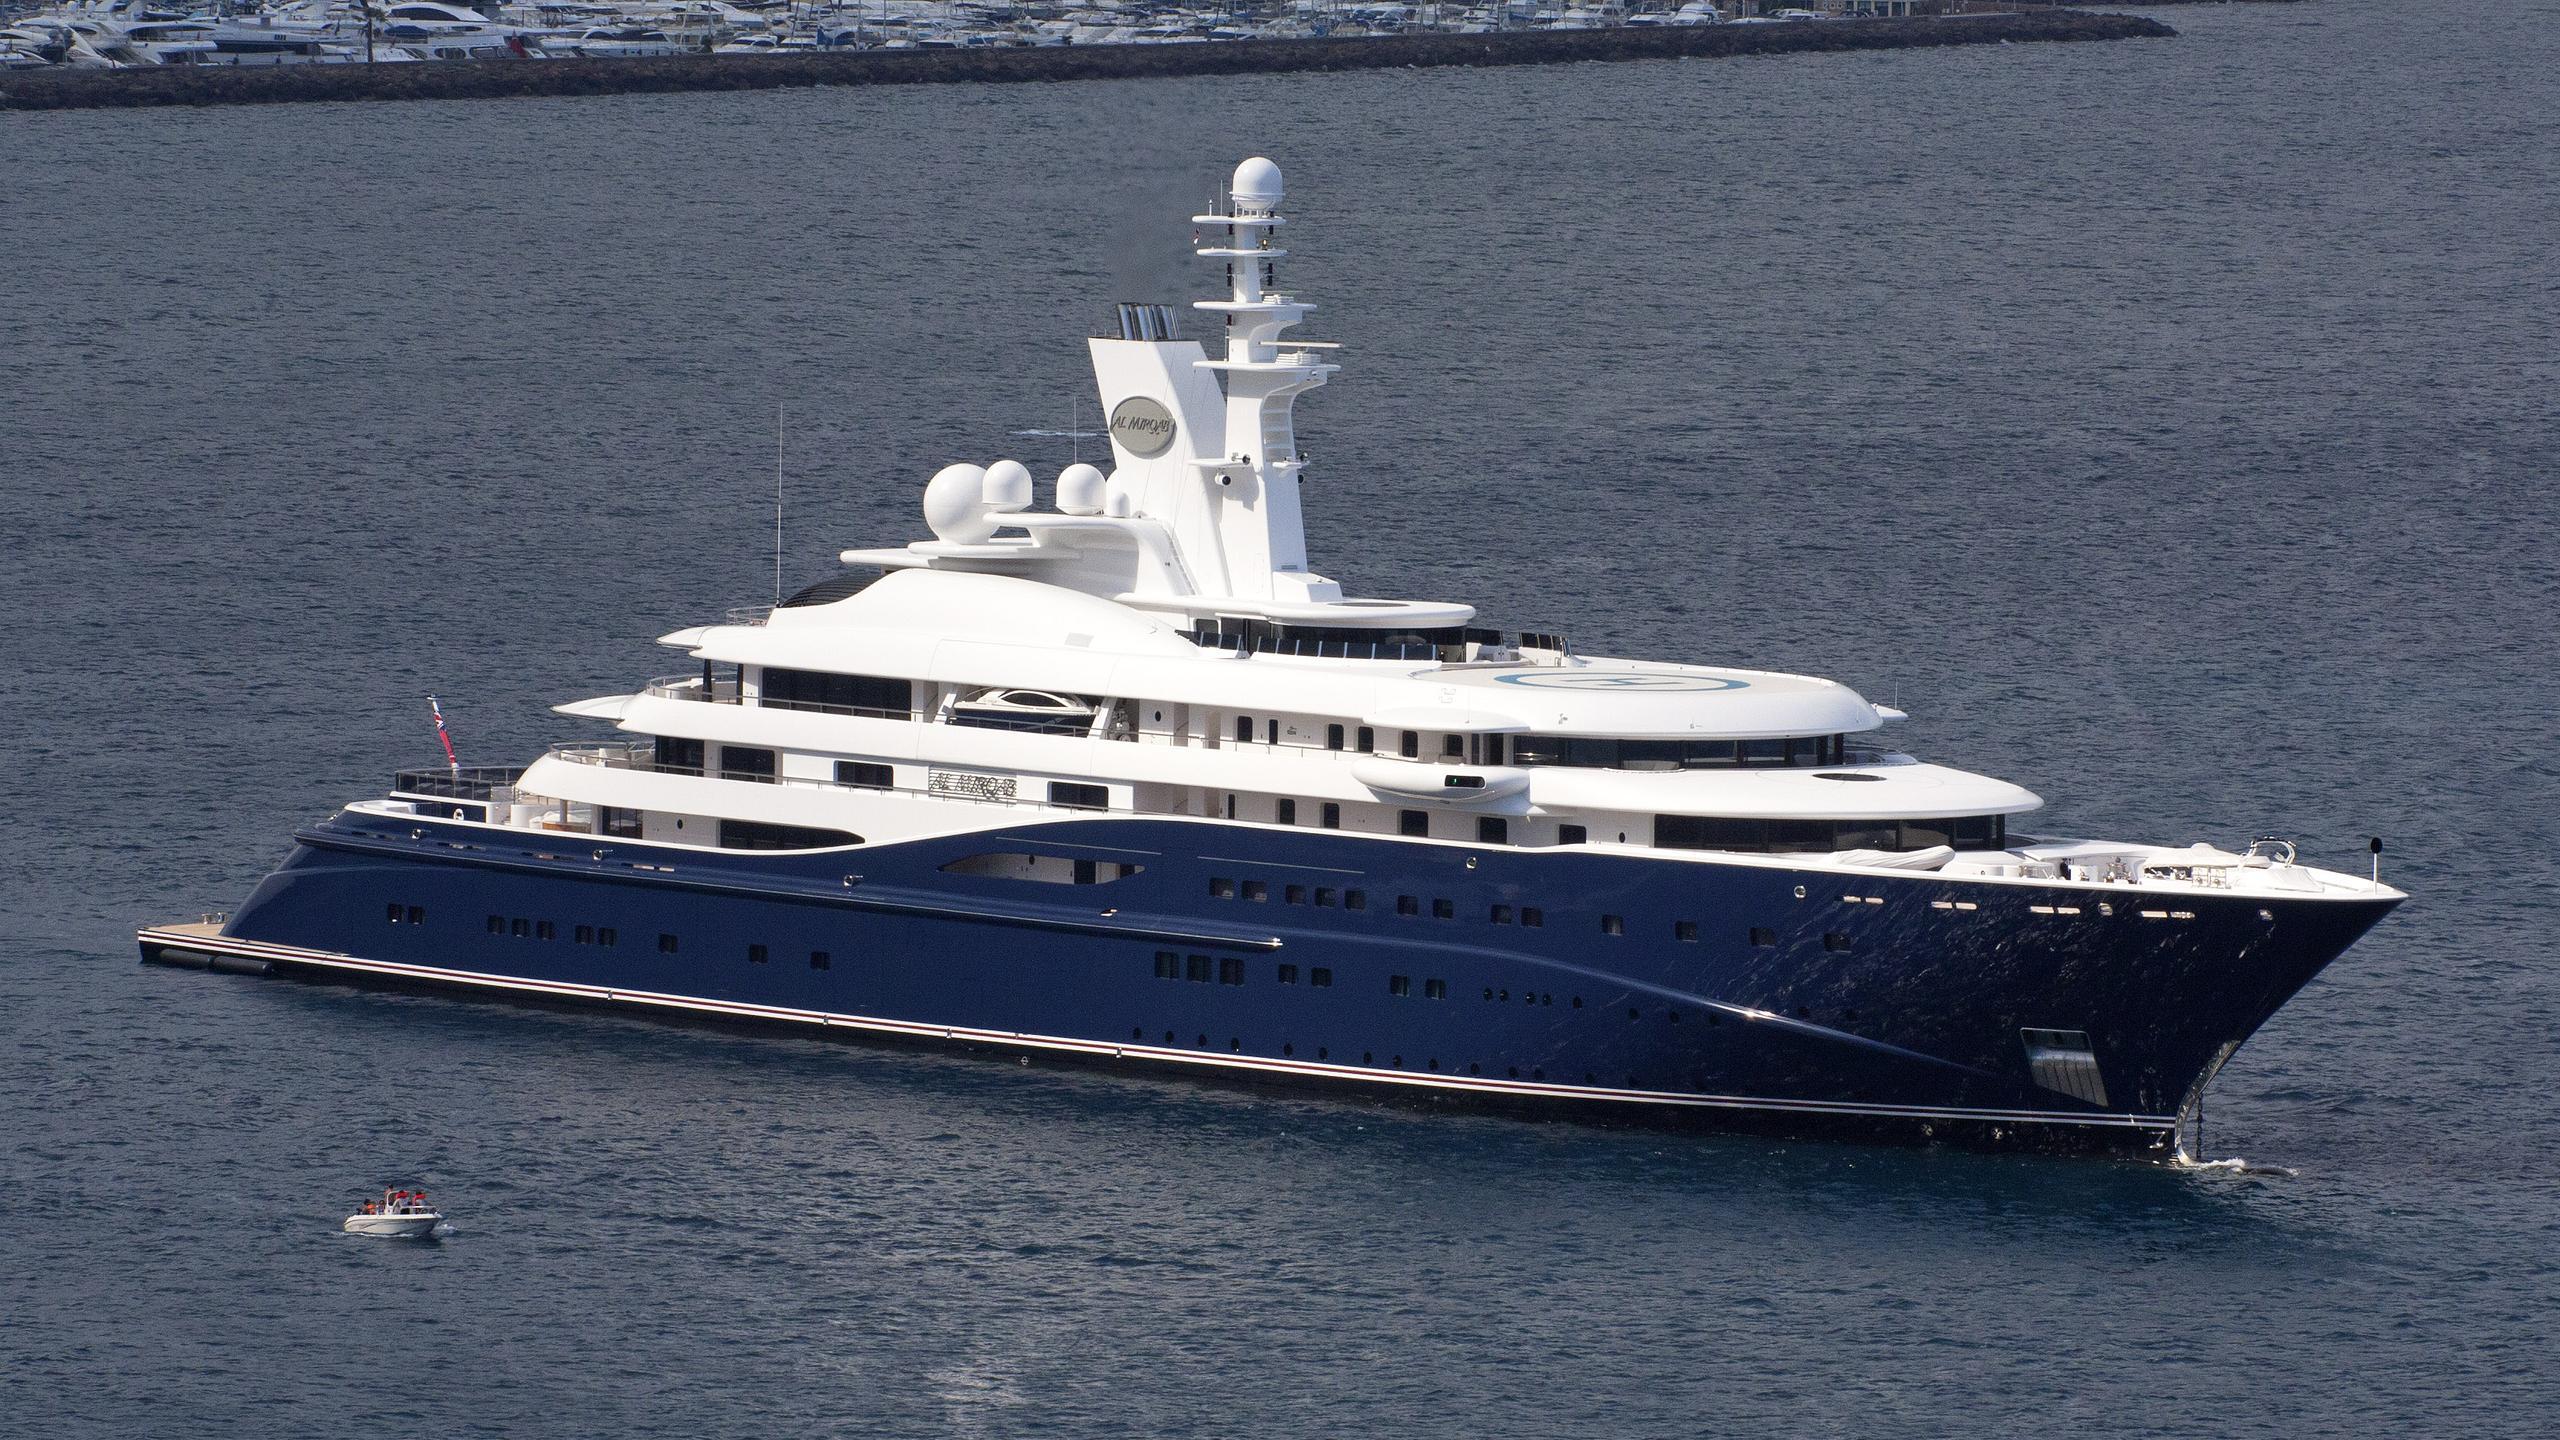 al-mirqab-motor-yacht-peterswerft-kusch-2008-133m-half-profile